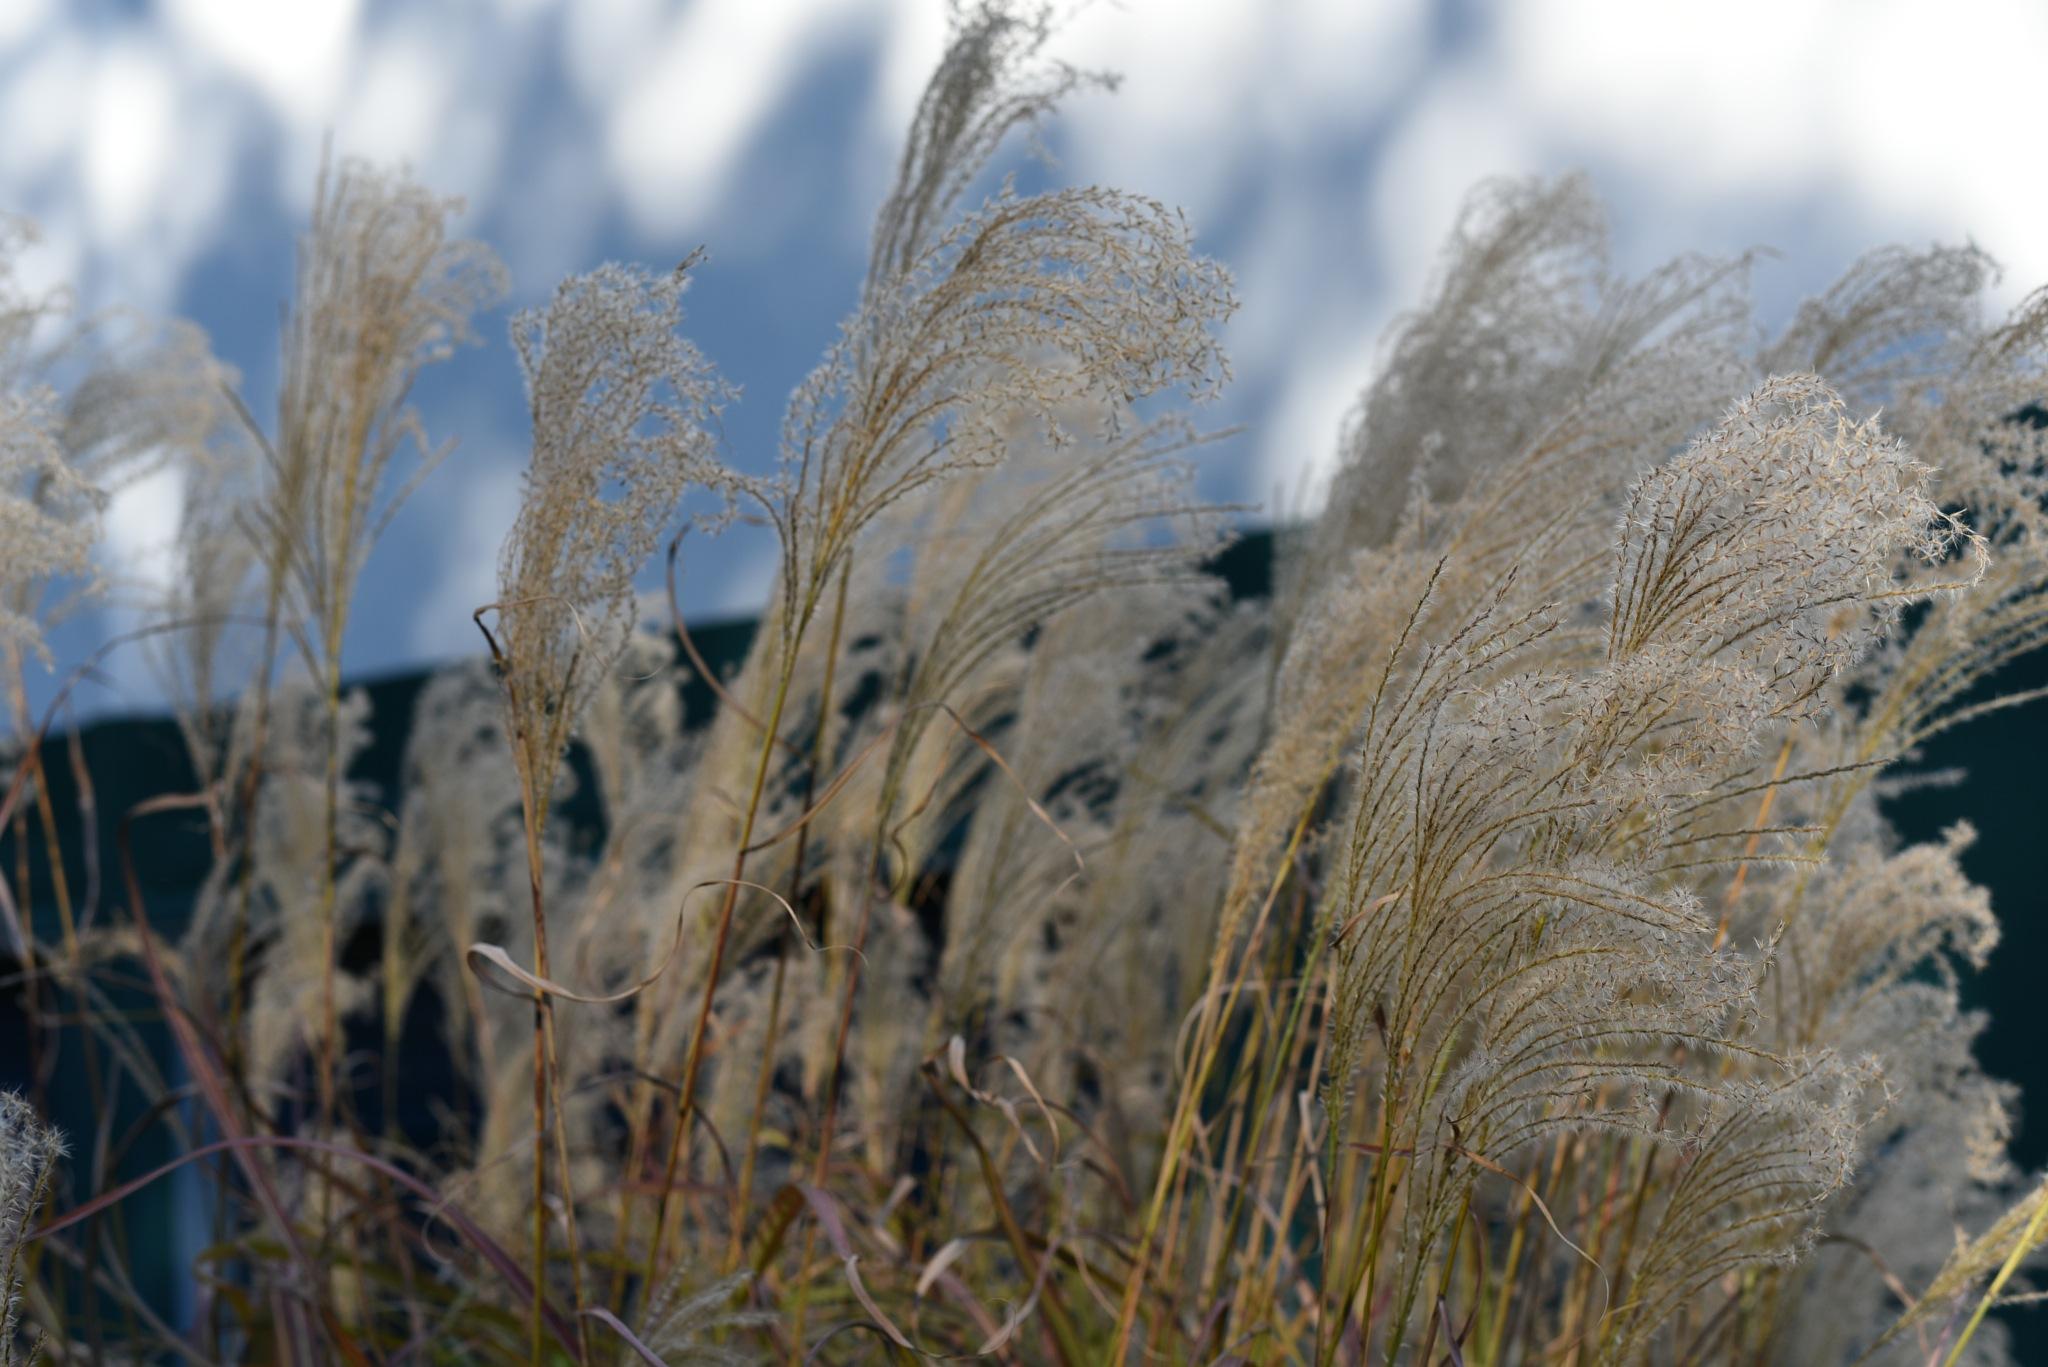 Photography Class - Brachytricha - Decorative grasses with fronds by Vizzpat